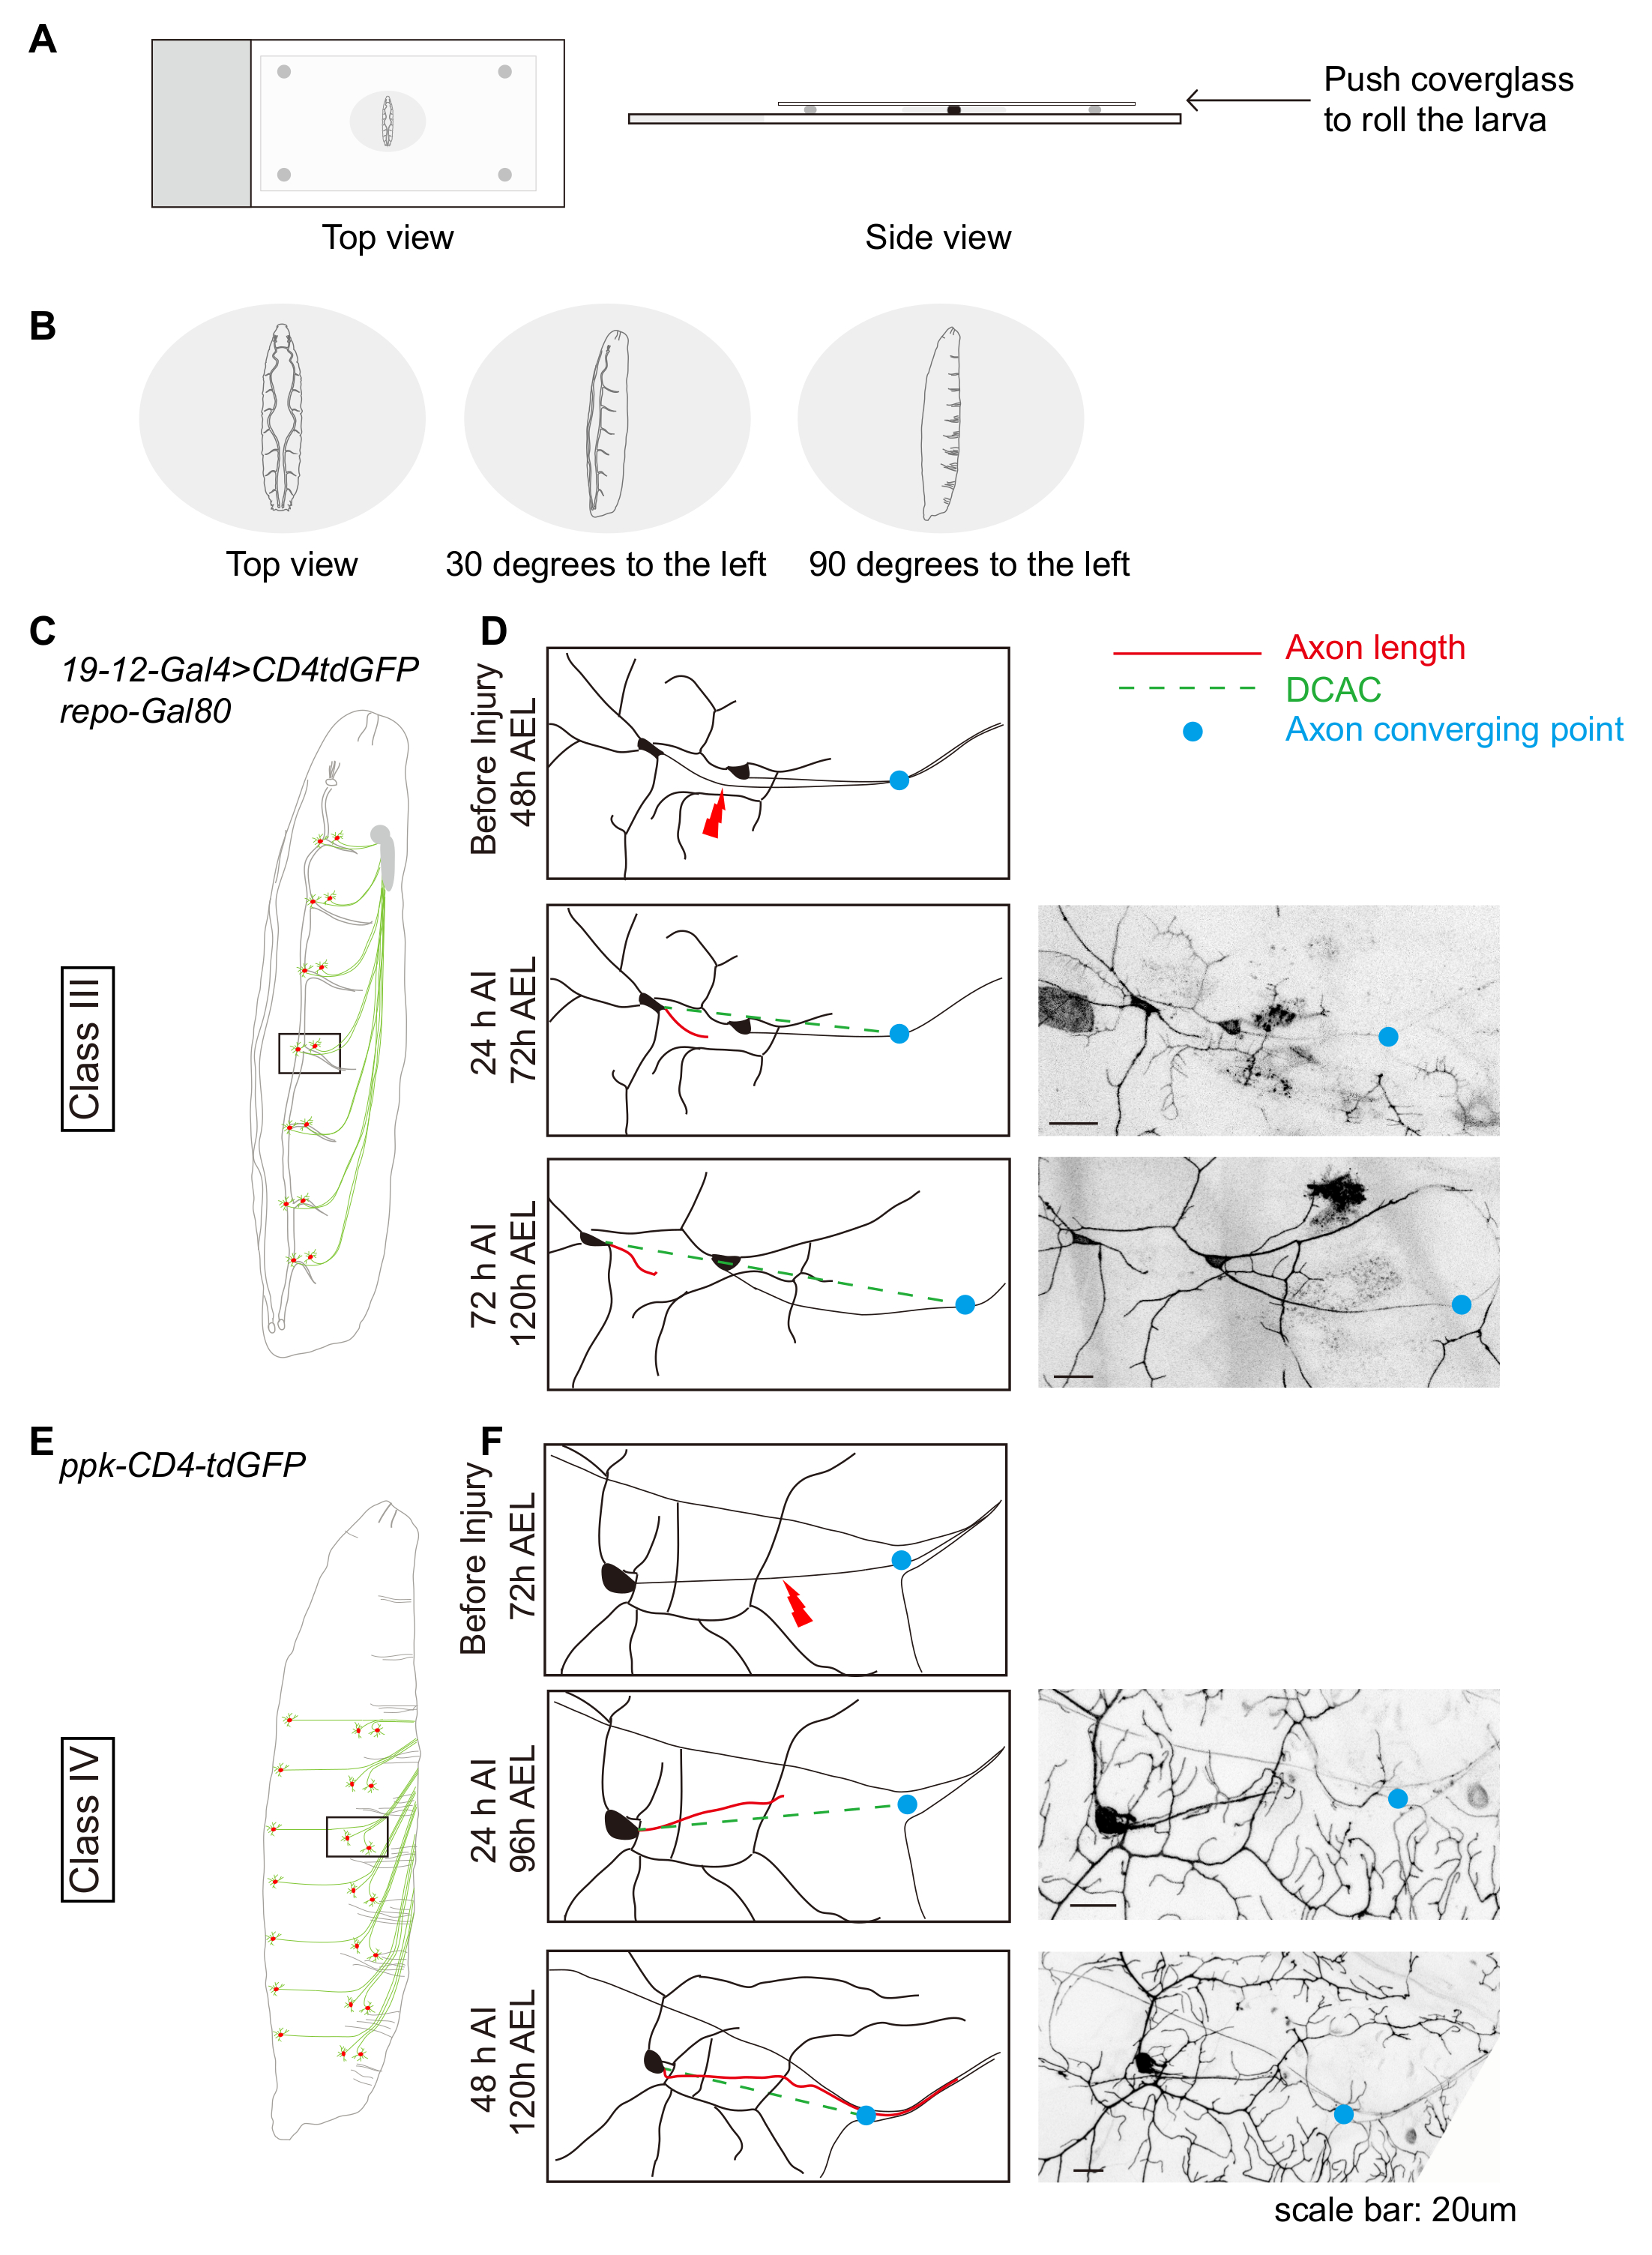 A Drosophila In Vivo Injury Model For Studying